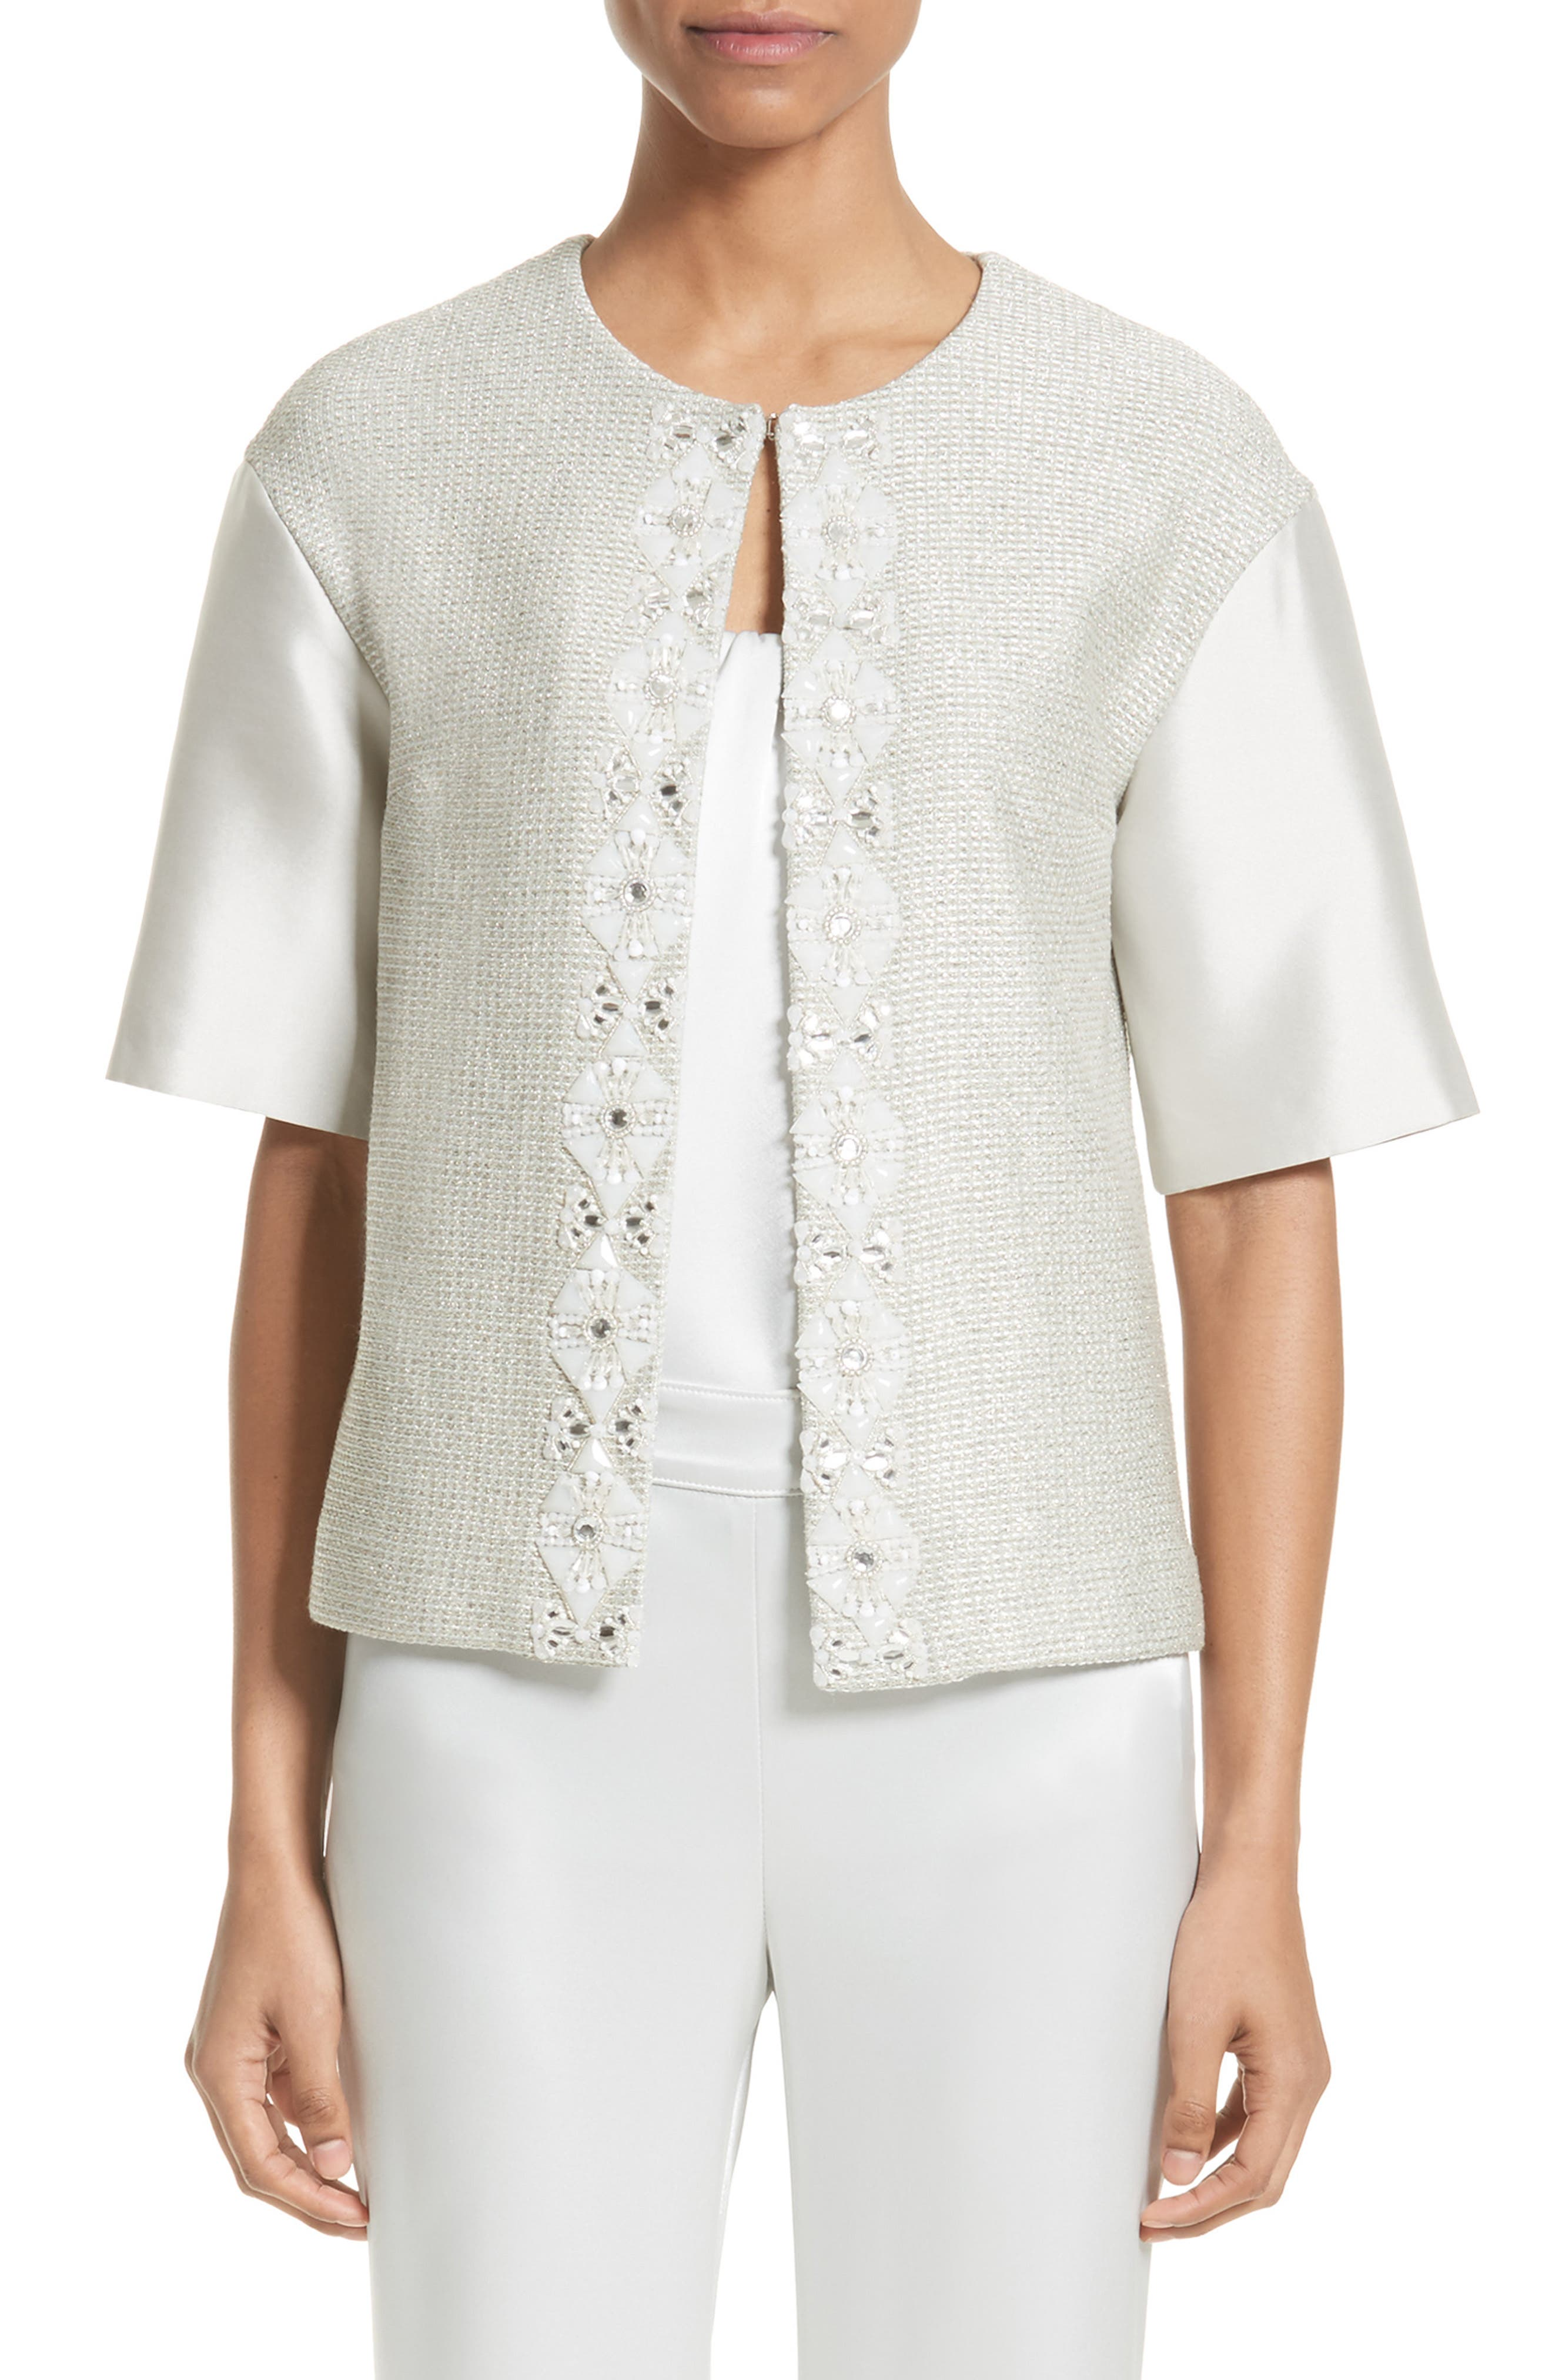 Alternate Image 1 Selected - St. John Collection Beaded Jasmine Sparkle Knit Jacket